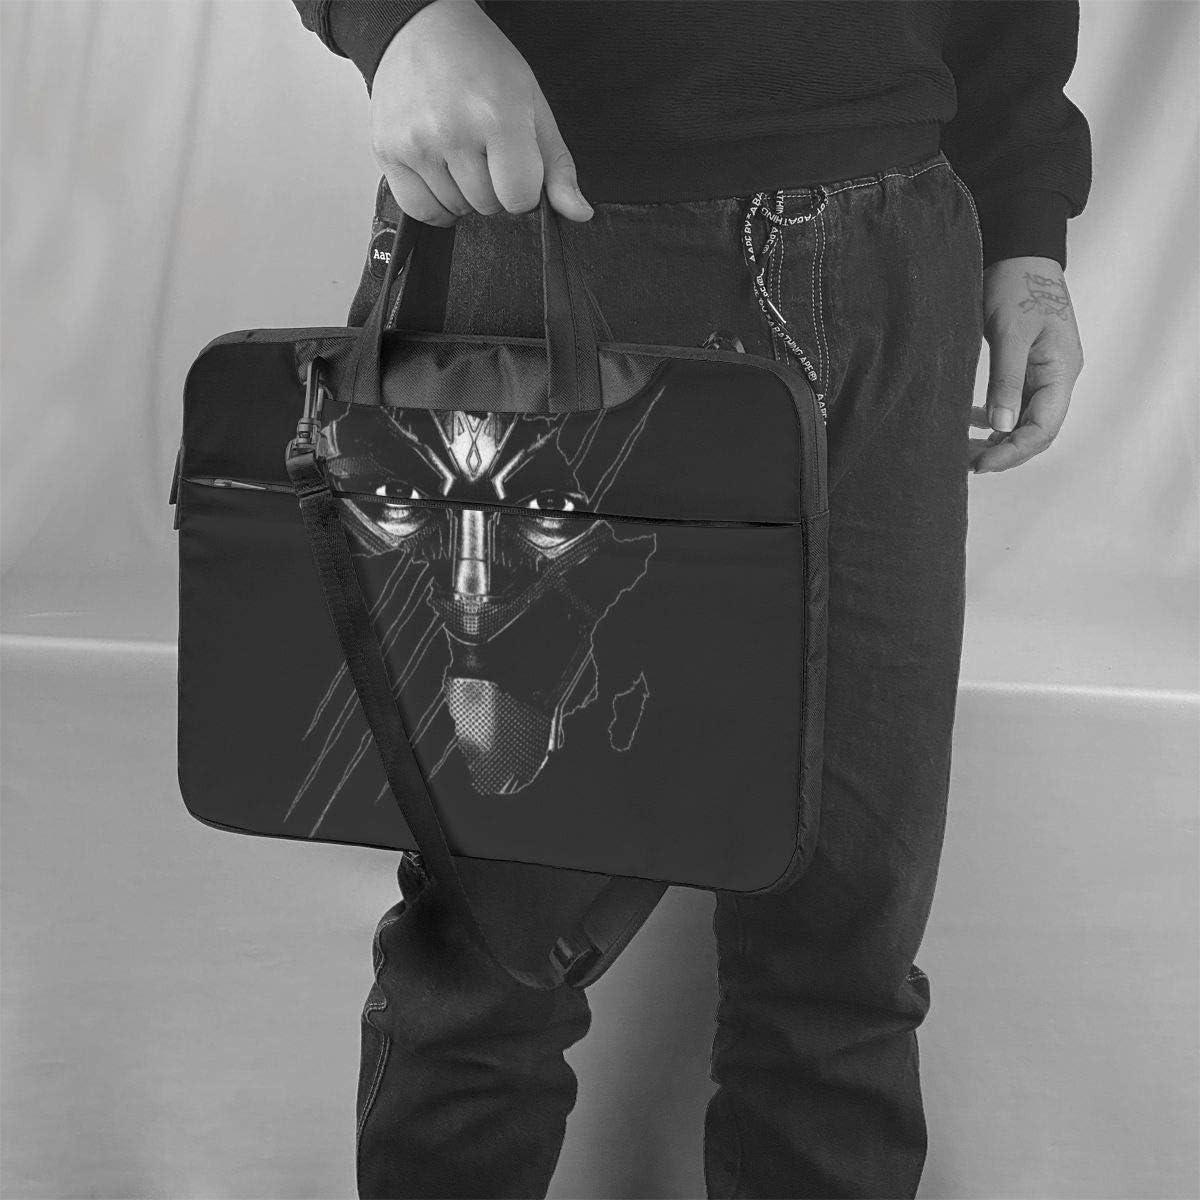 Superhero Superhero Panther Laptop Bag Laptop Messenger Bag Laptop Shoulder Bags Polyester Messenger Carrying Briefcase Sleeve with Adjustable Depth at Bottom 14 inch